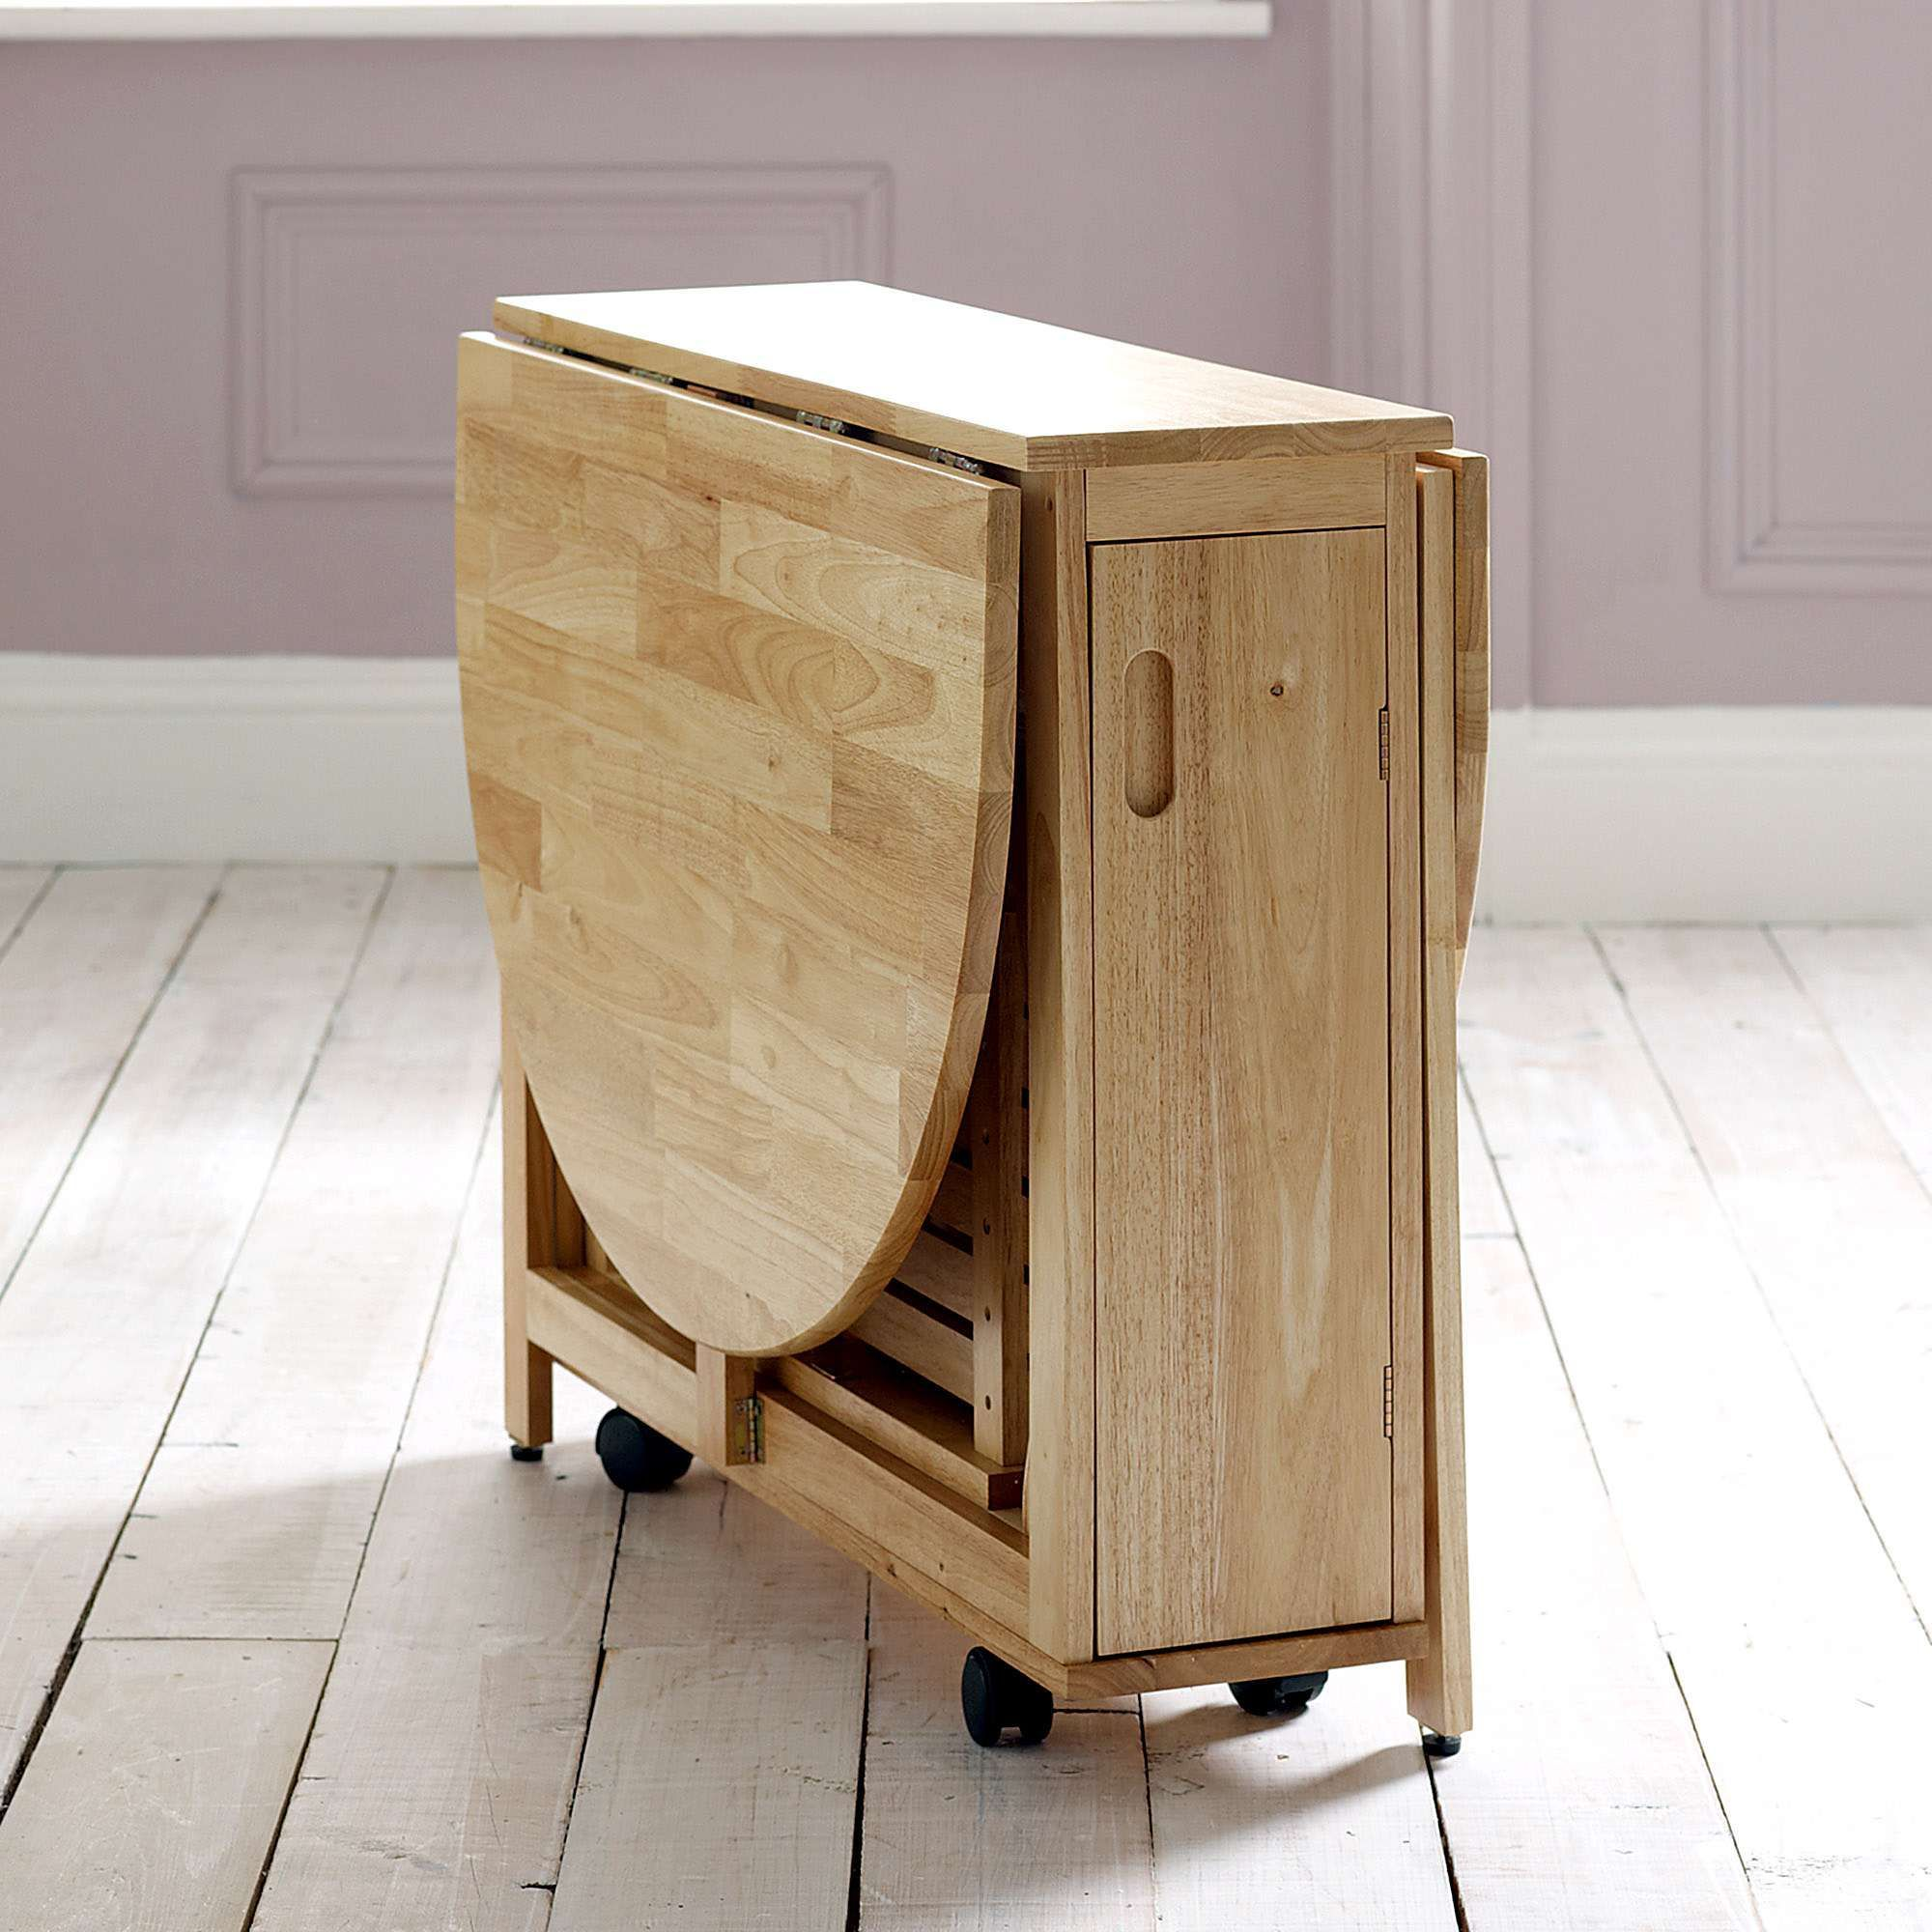 - Folding Dining Tables Choose A Folding Dining Table (2) VDBSBCE